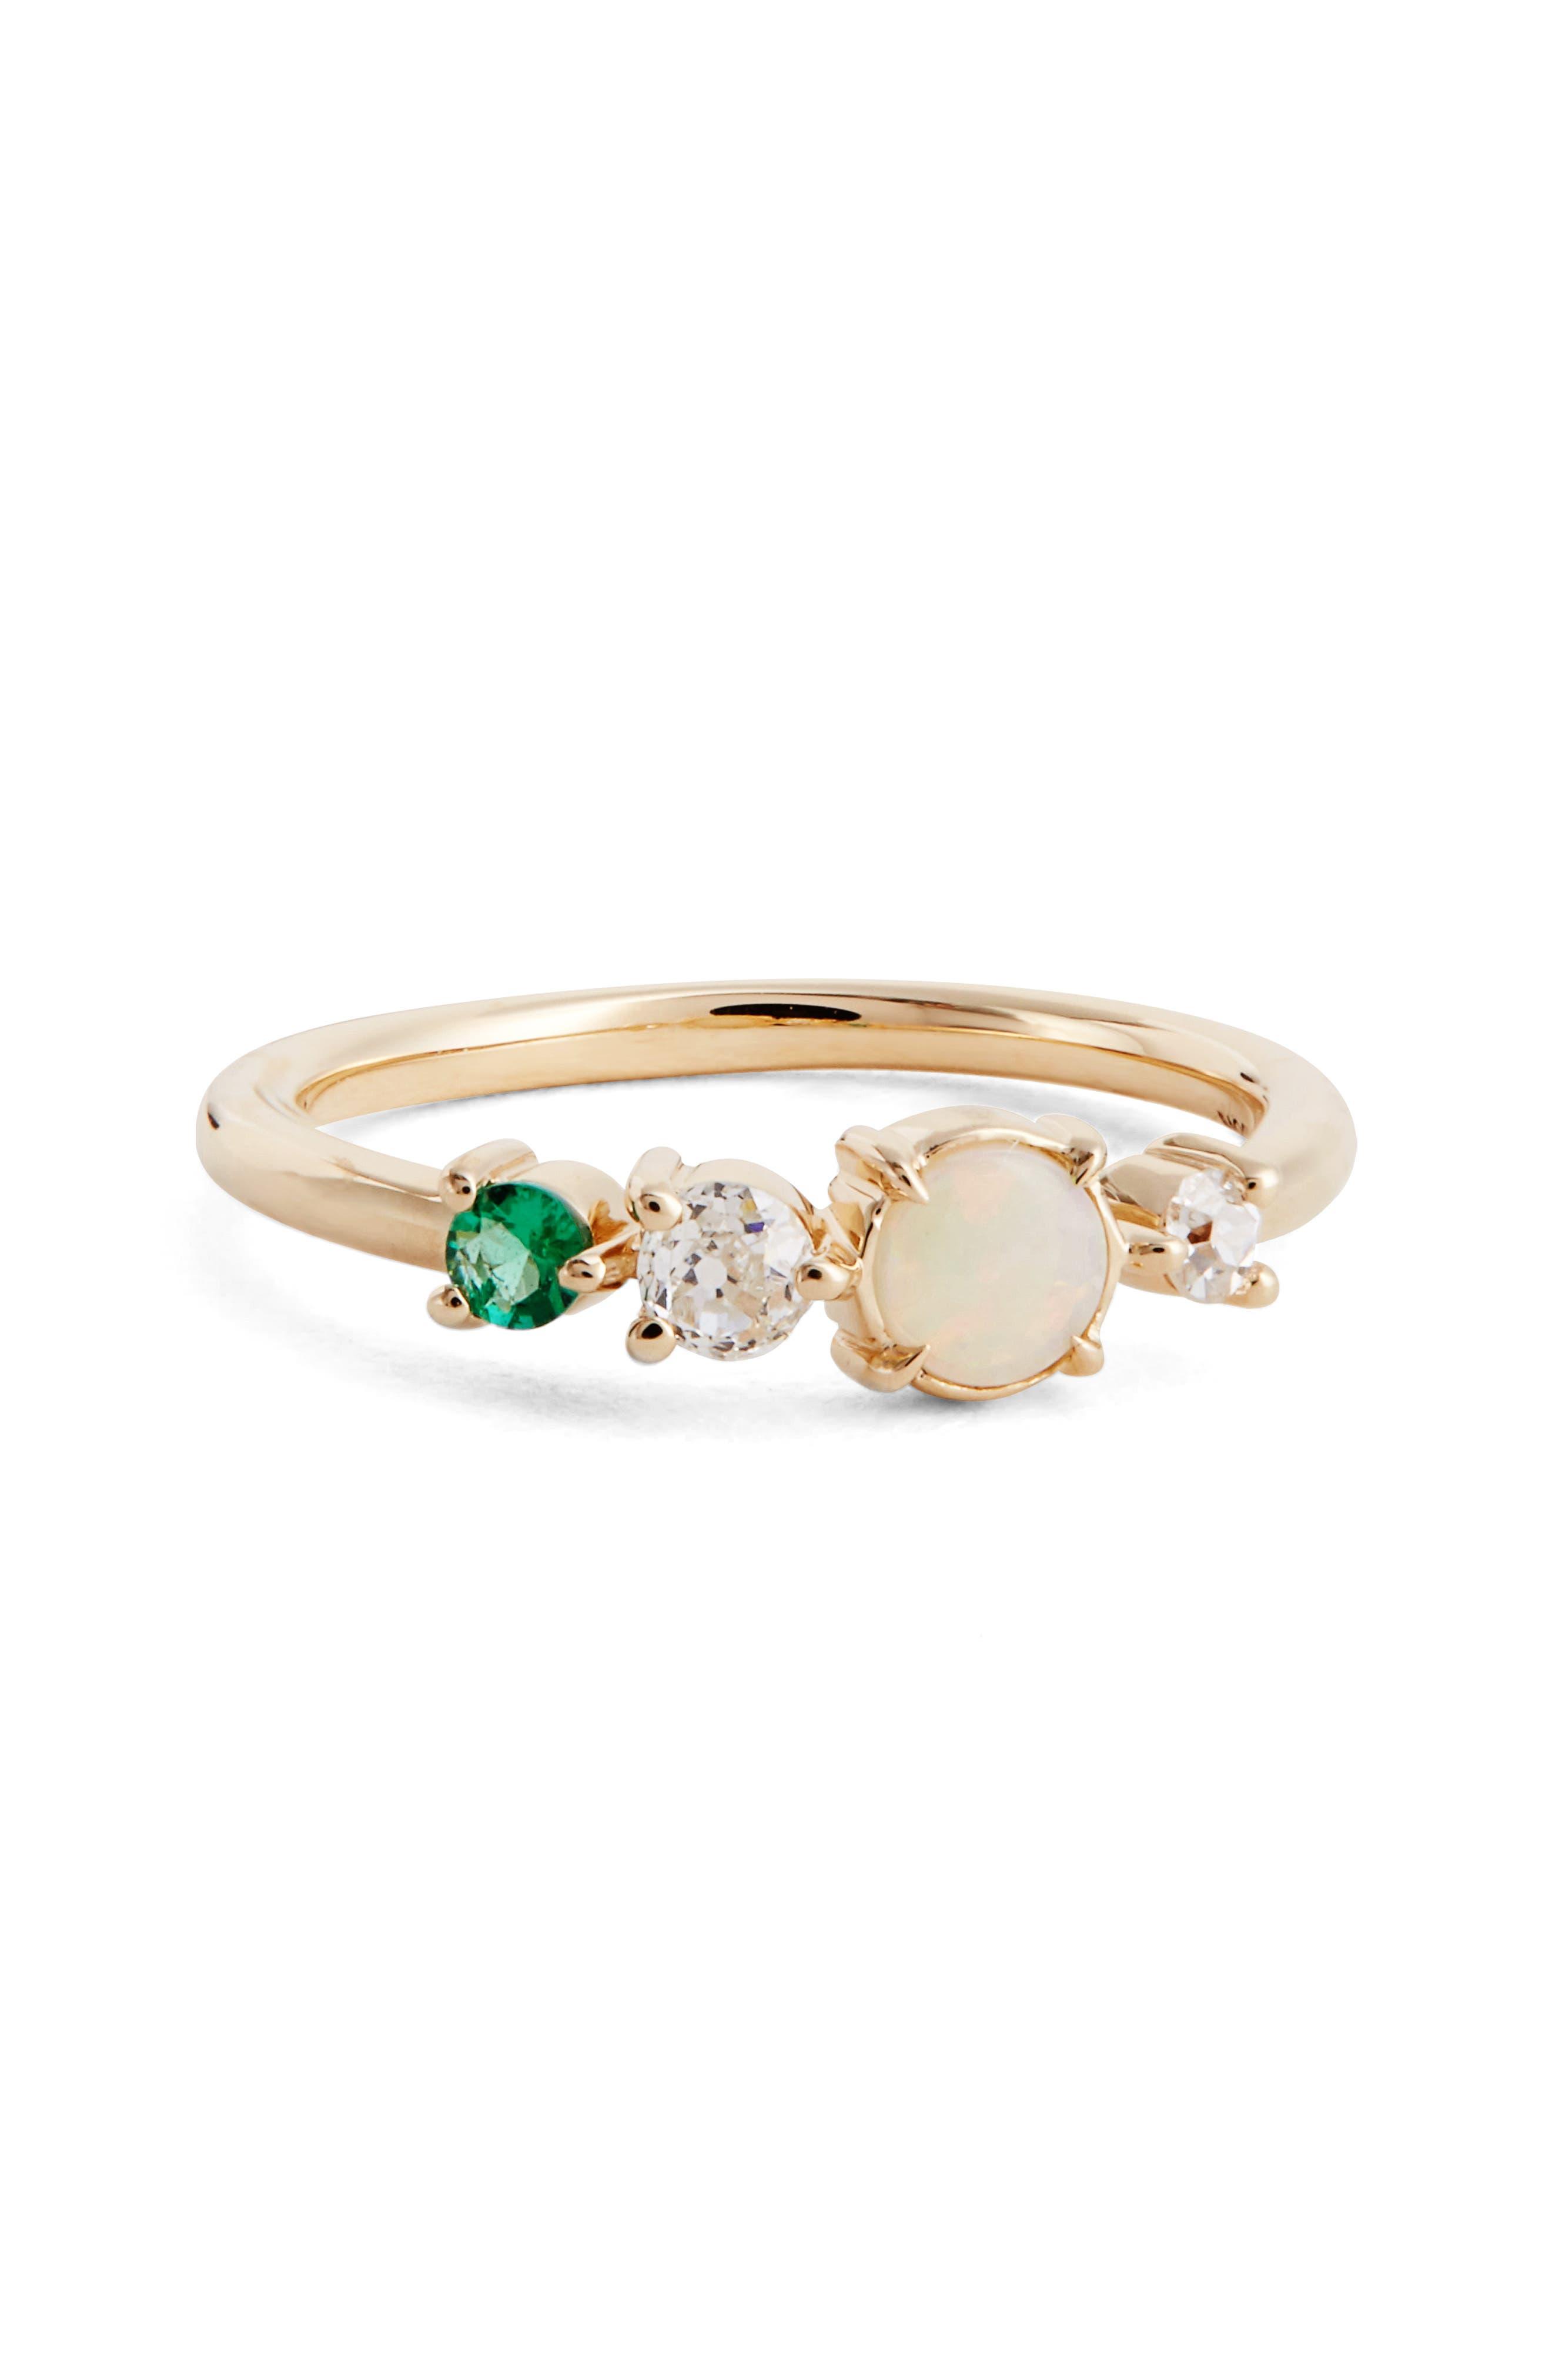 Emerald, Opal & Diamond Ring,                             Main thumbnail 1, color,                             340